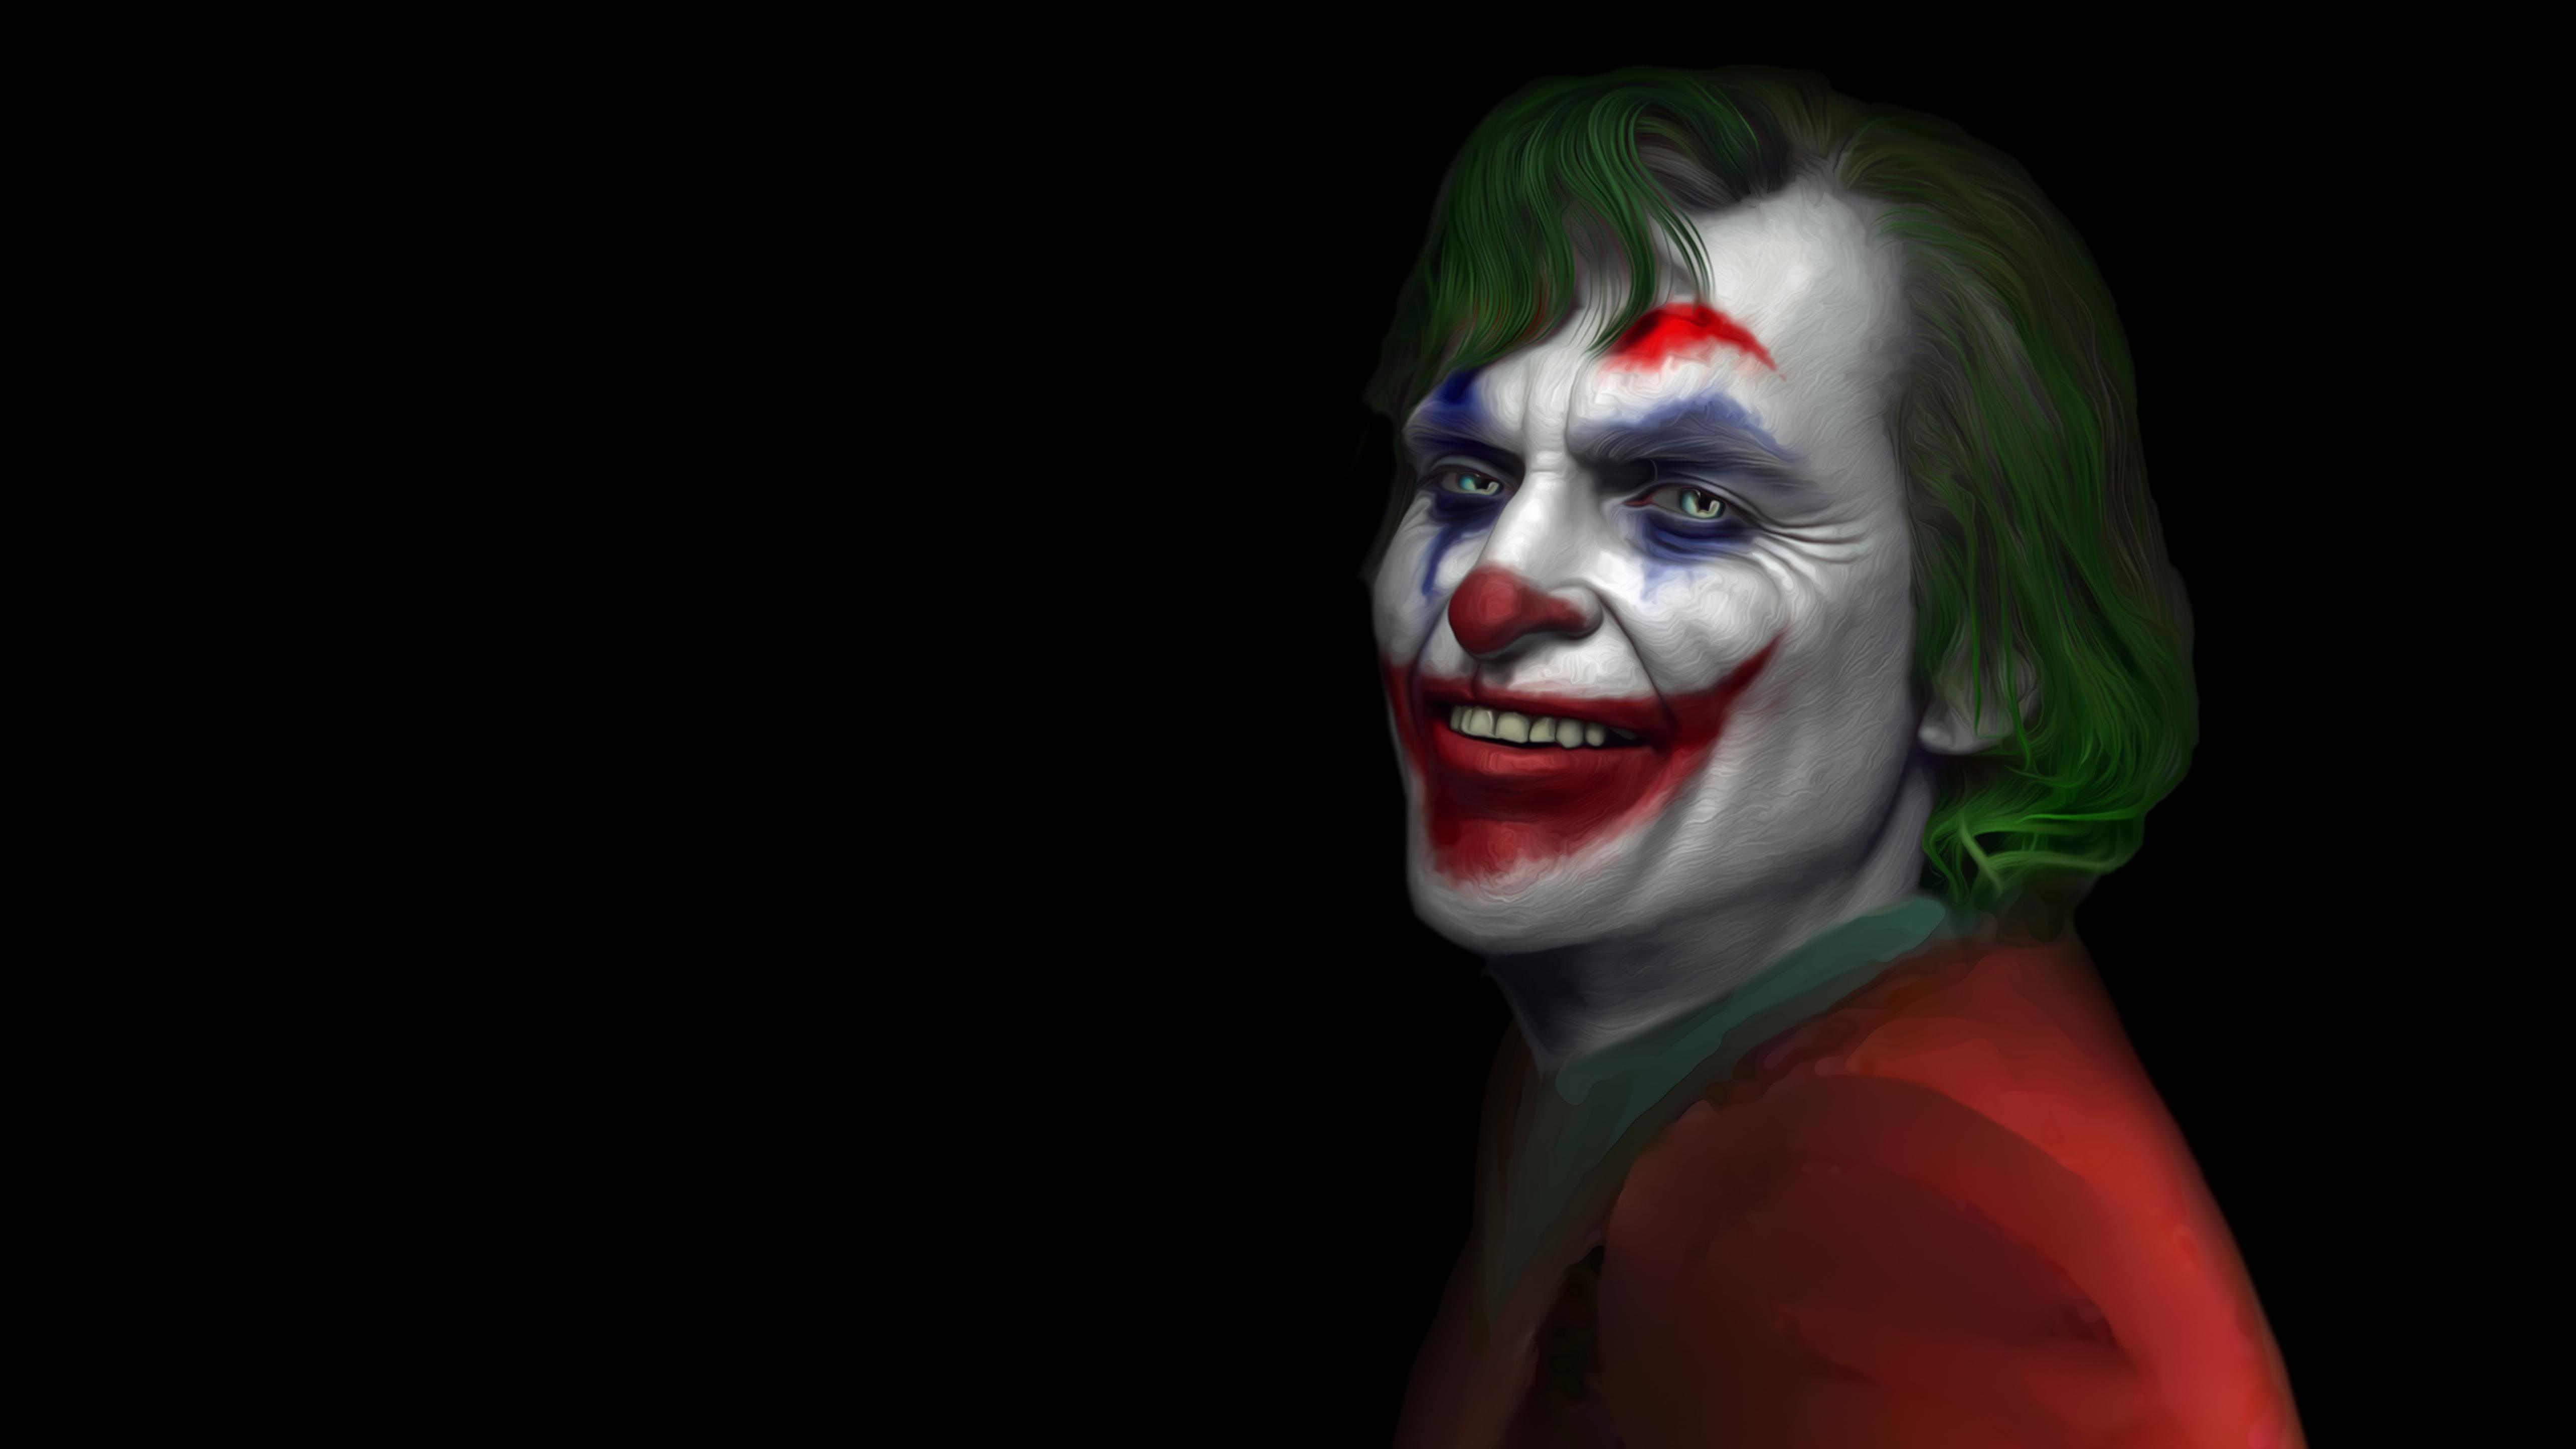 5120x2880 Joker Movie Art 5K Wallpaper, HD Movies 4K ...